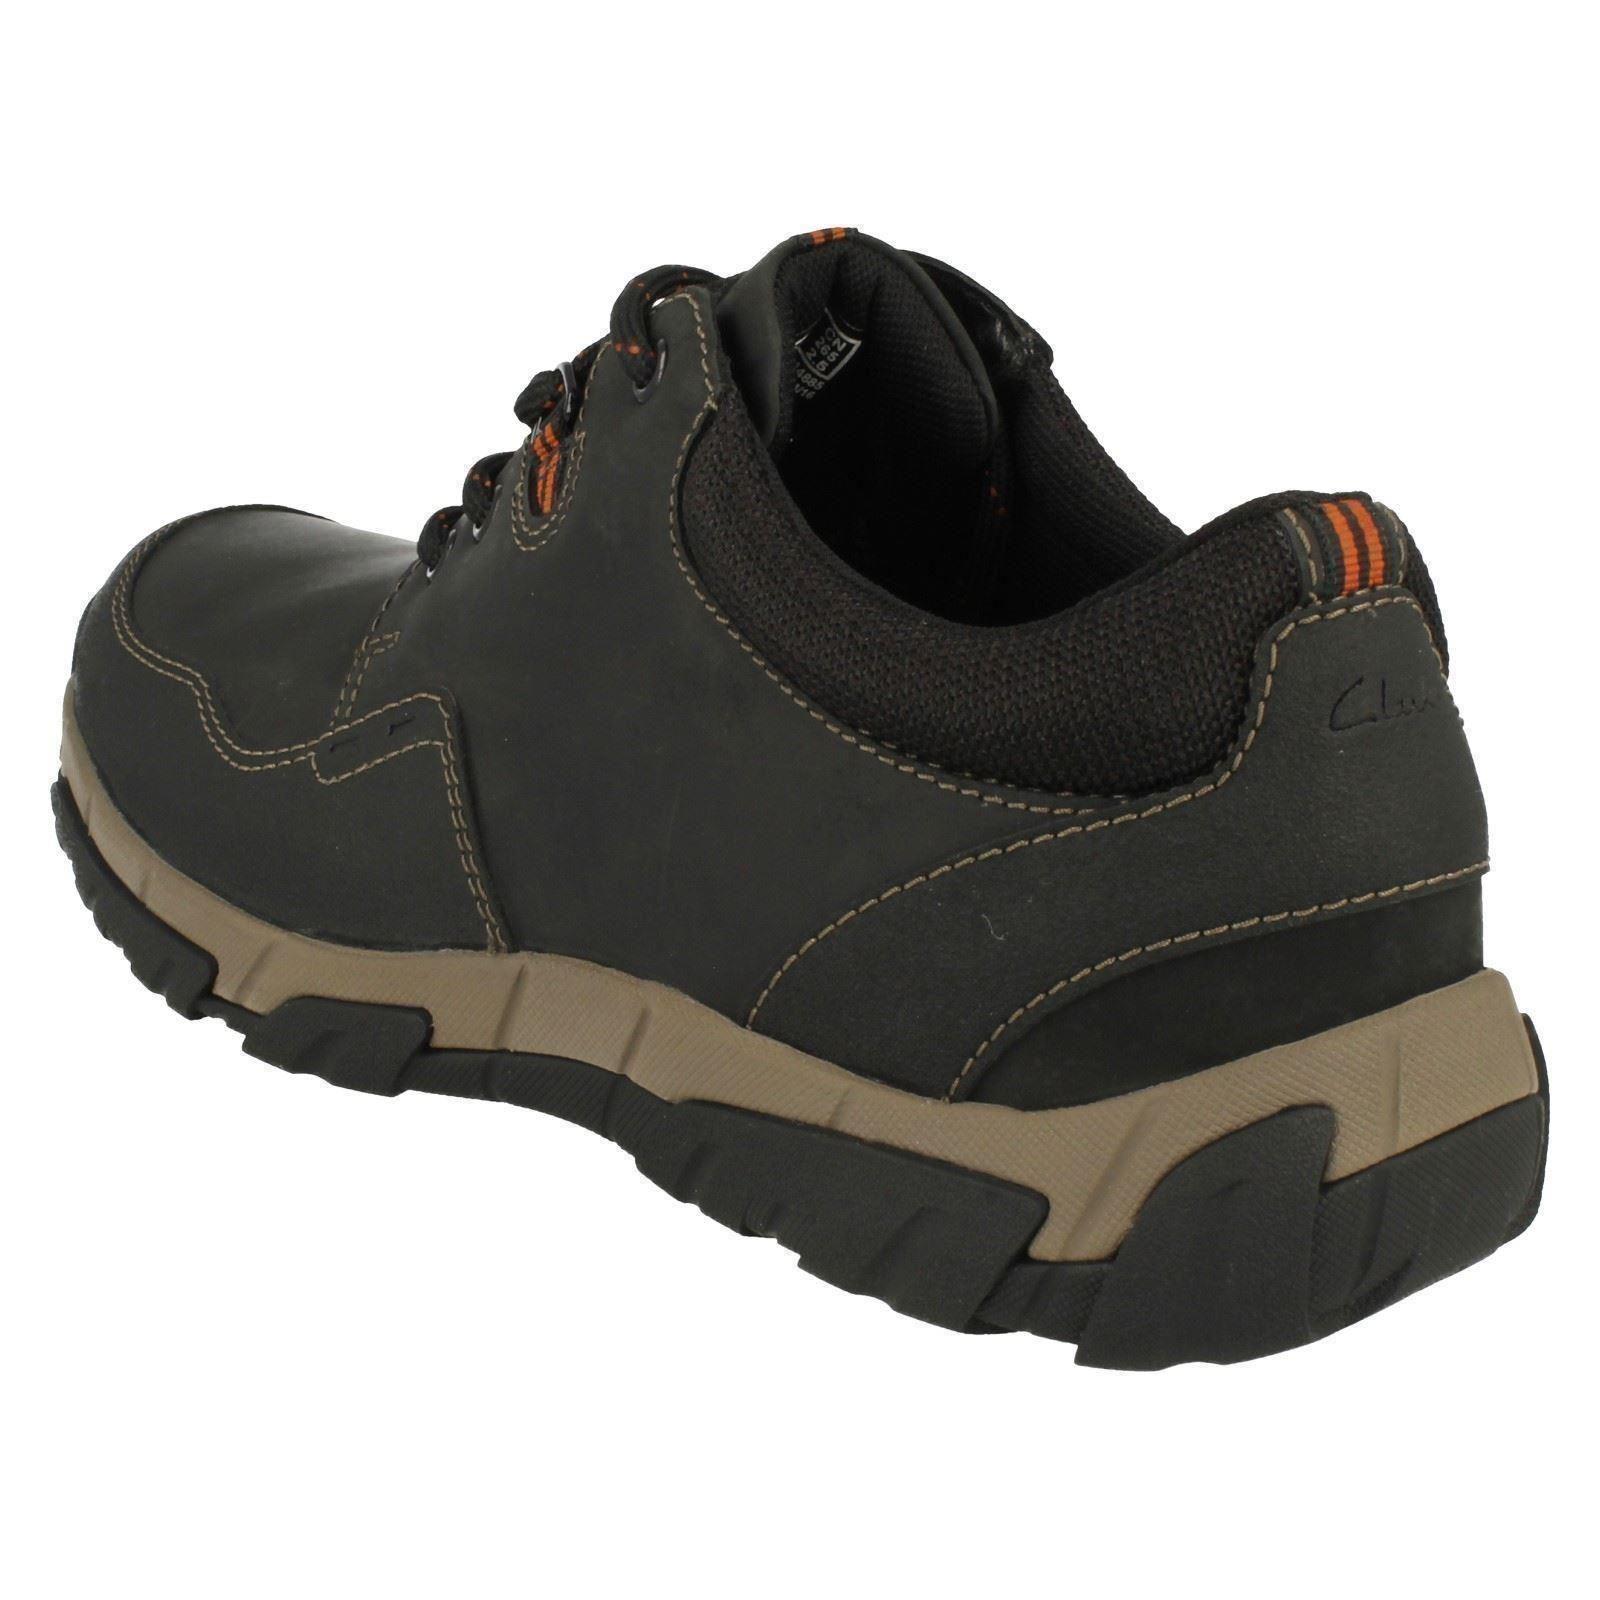 Informal Impermeable Zapatos De Detalles Edge Cordones Con Hombre Walbeck Clarks AjLR4Scq35